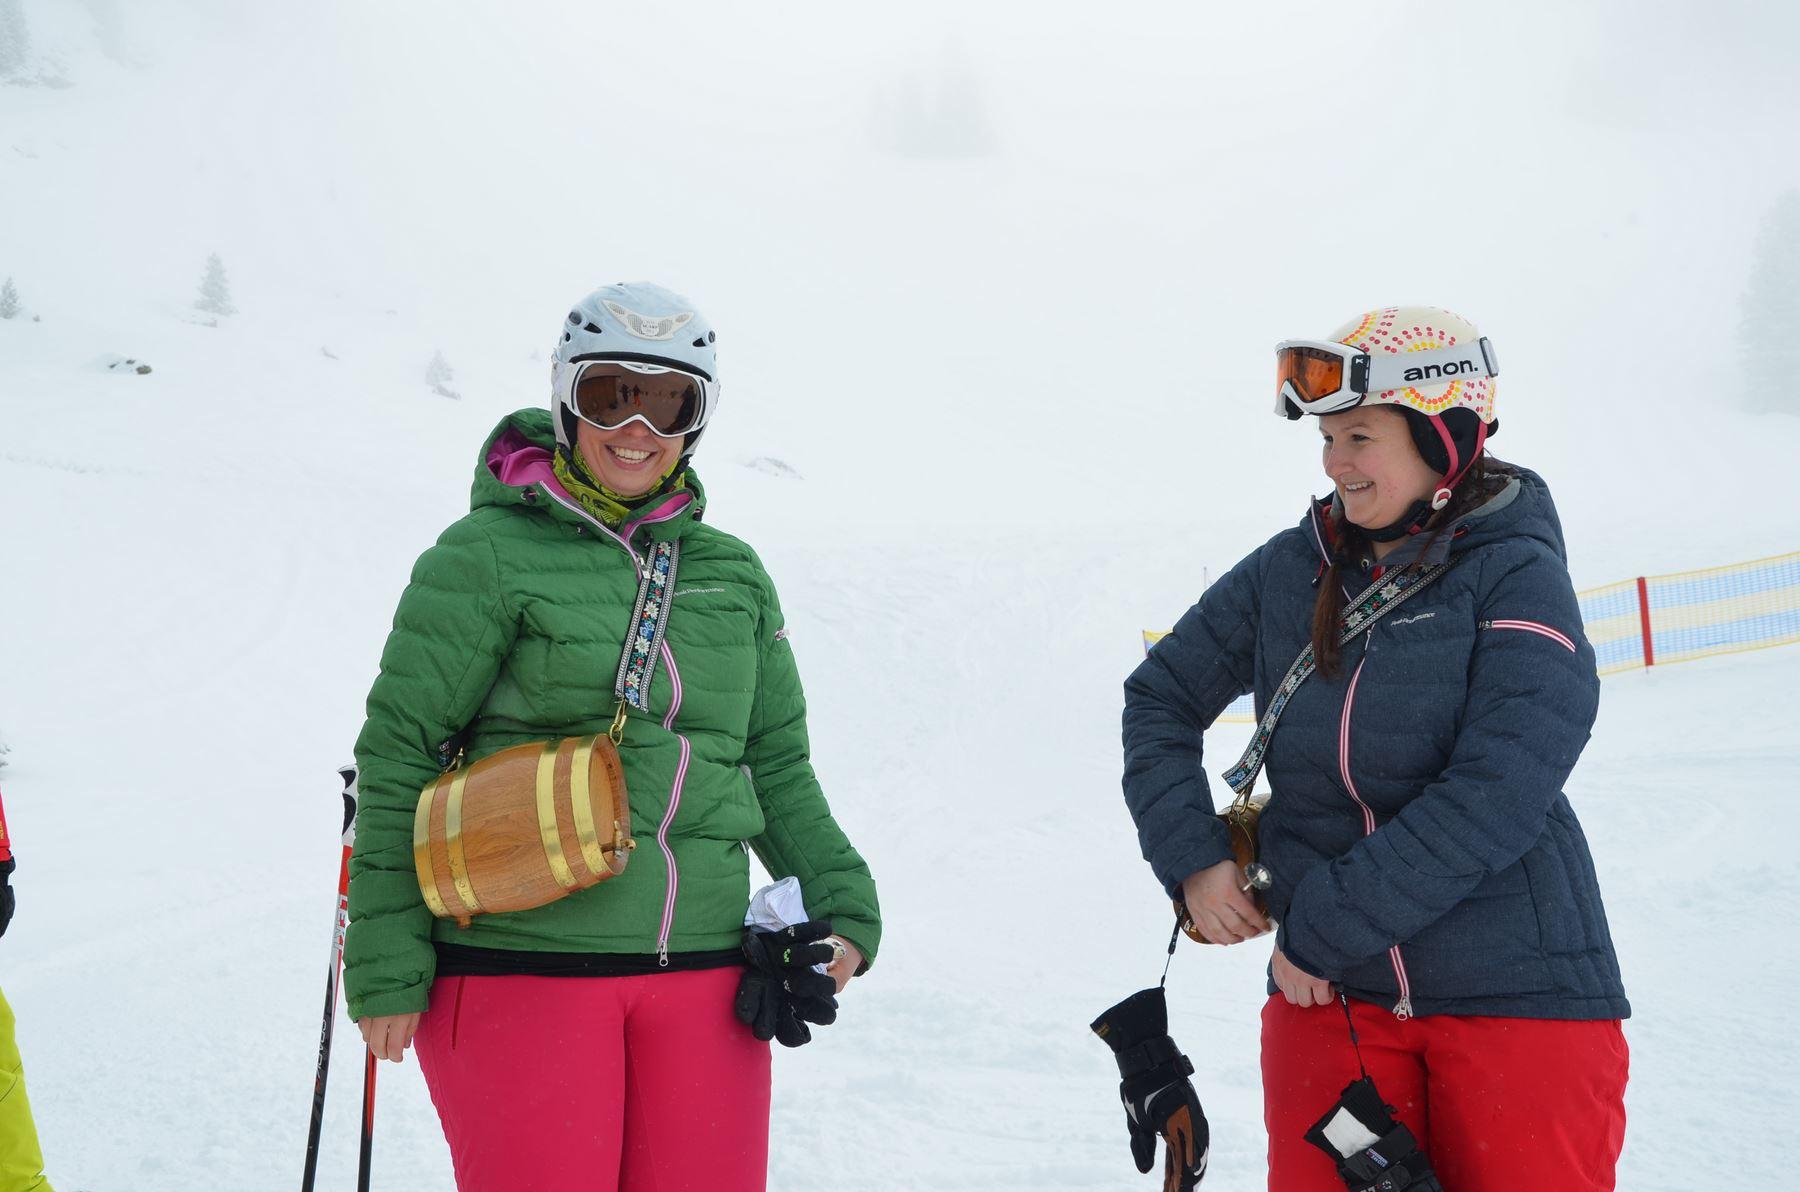 2015-03-22 BV Zillertal Skirennen 003.JPG